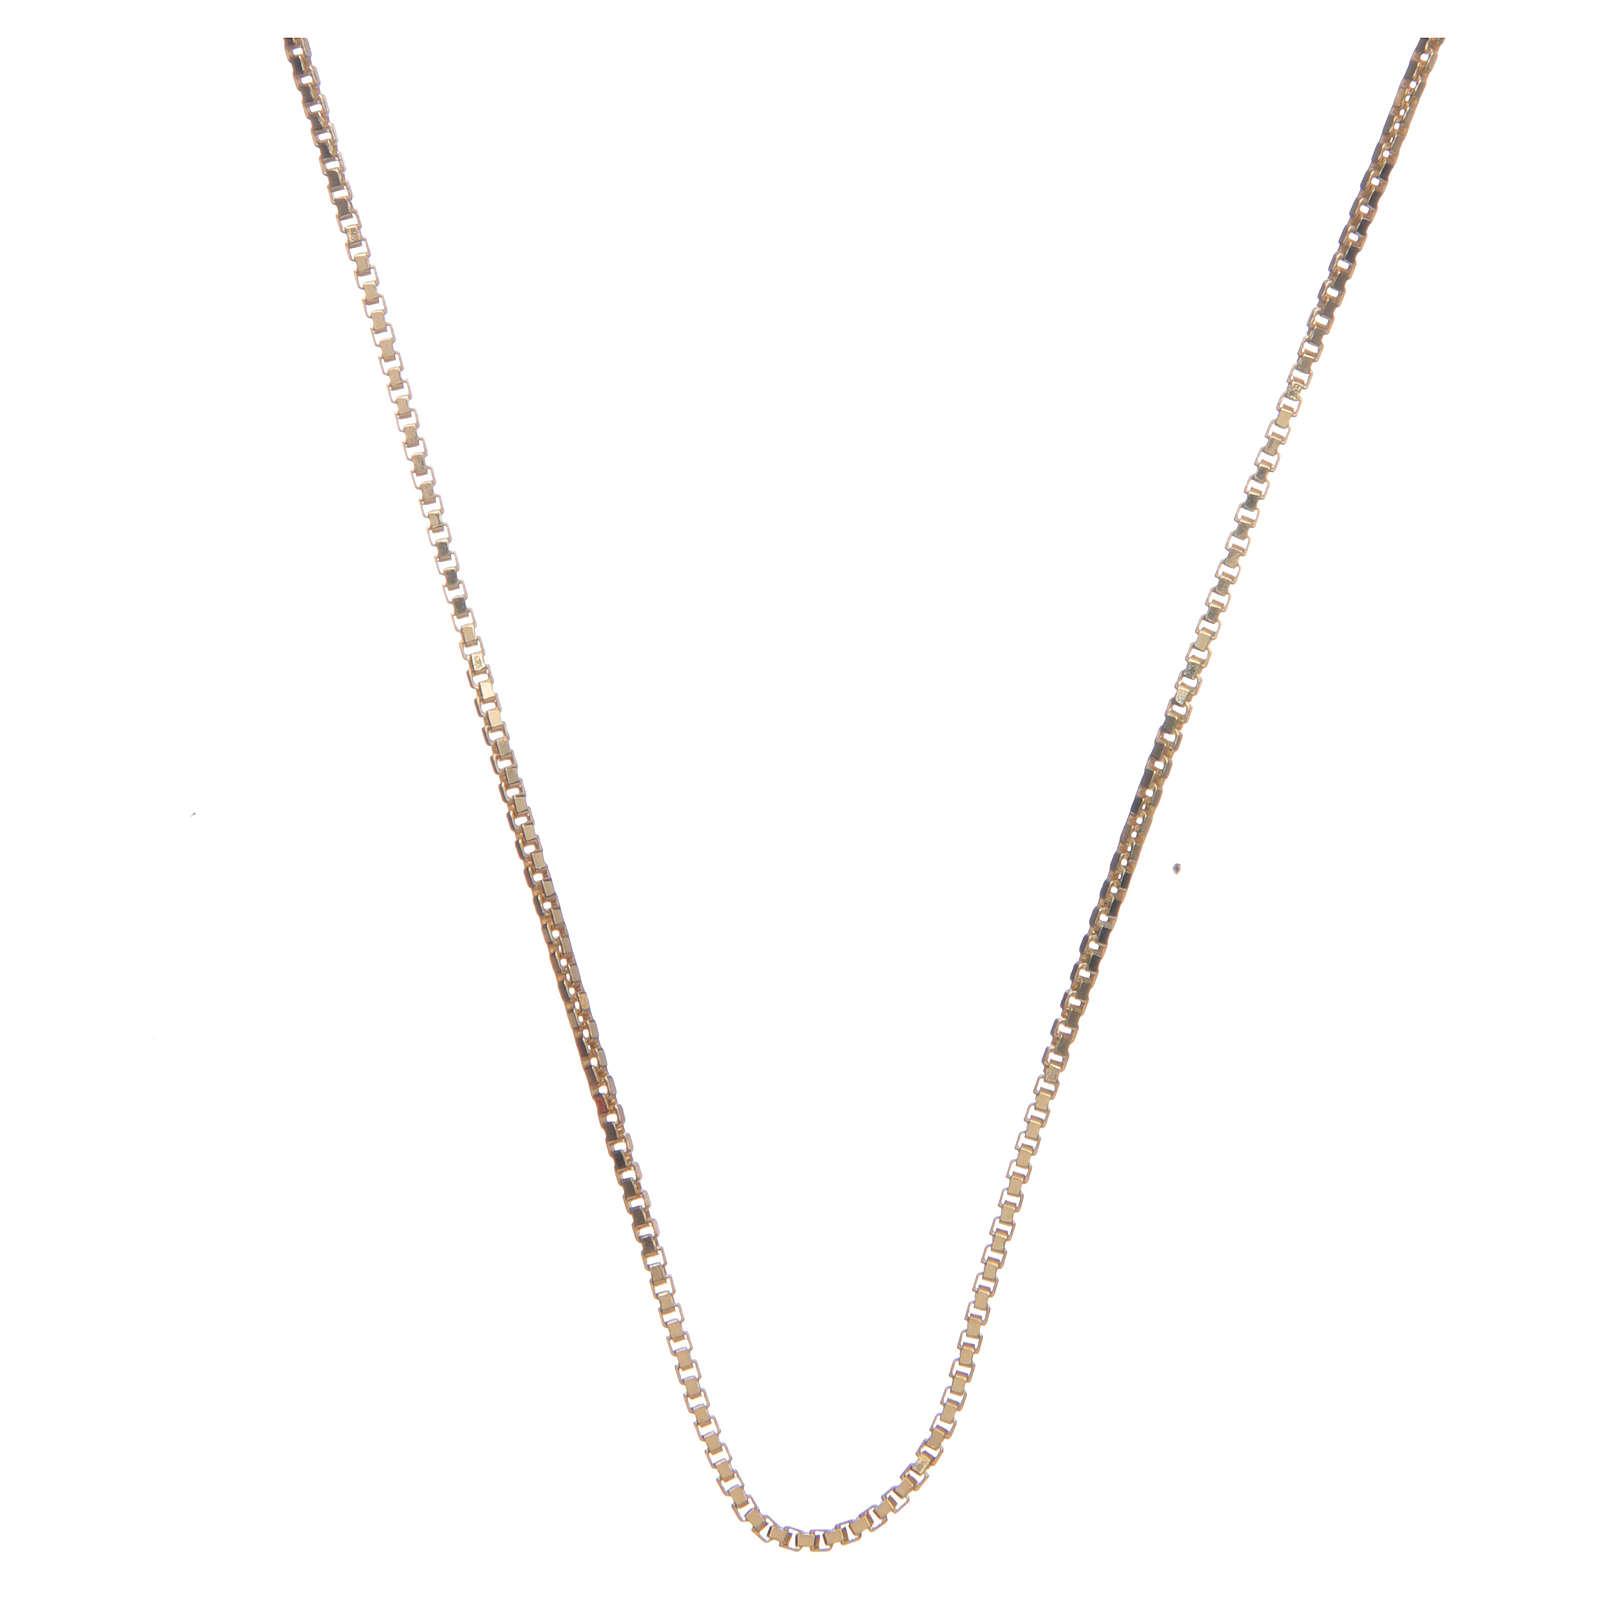 Catena veneta argento 925 dorato lung. 55 cm 4